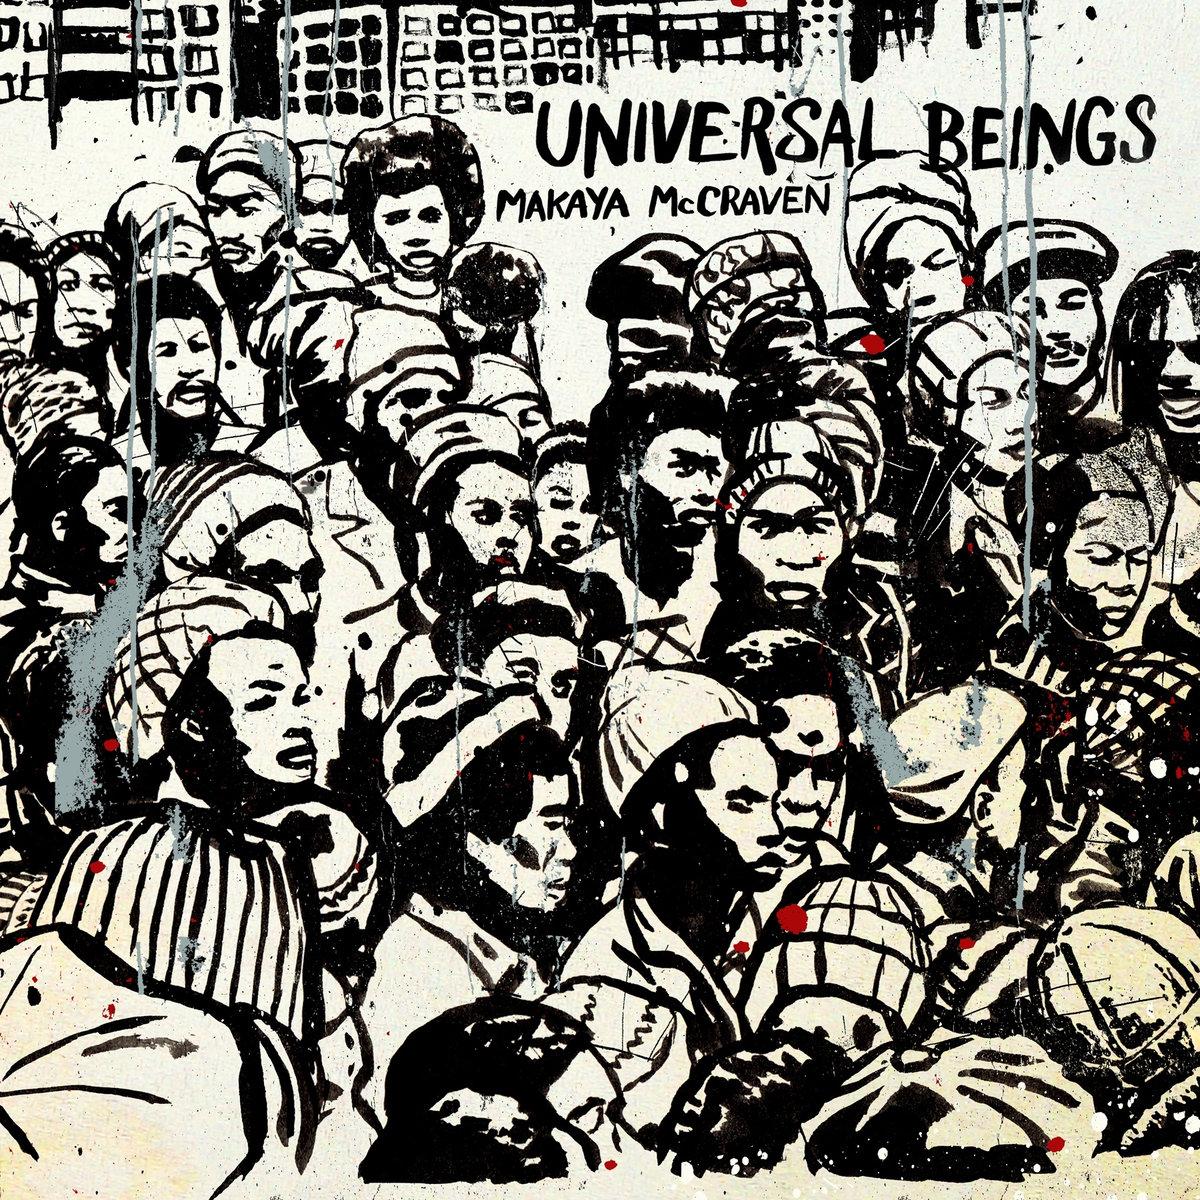 Universal BeingsMakaya McCraven - LINKSOfficial SiteFacebookTwitterInstagramLISTEN ONSpotify Apple MusicBandcamp